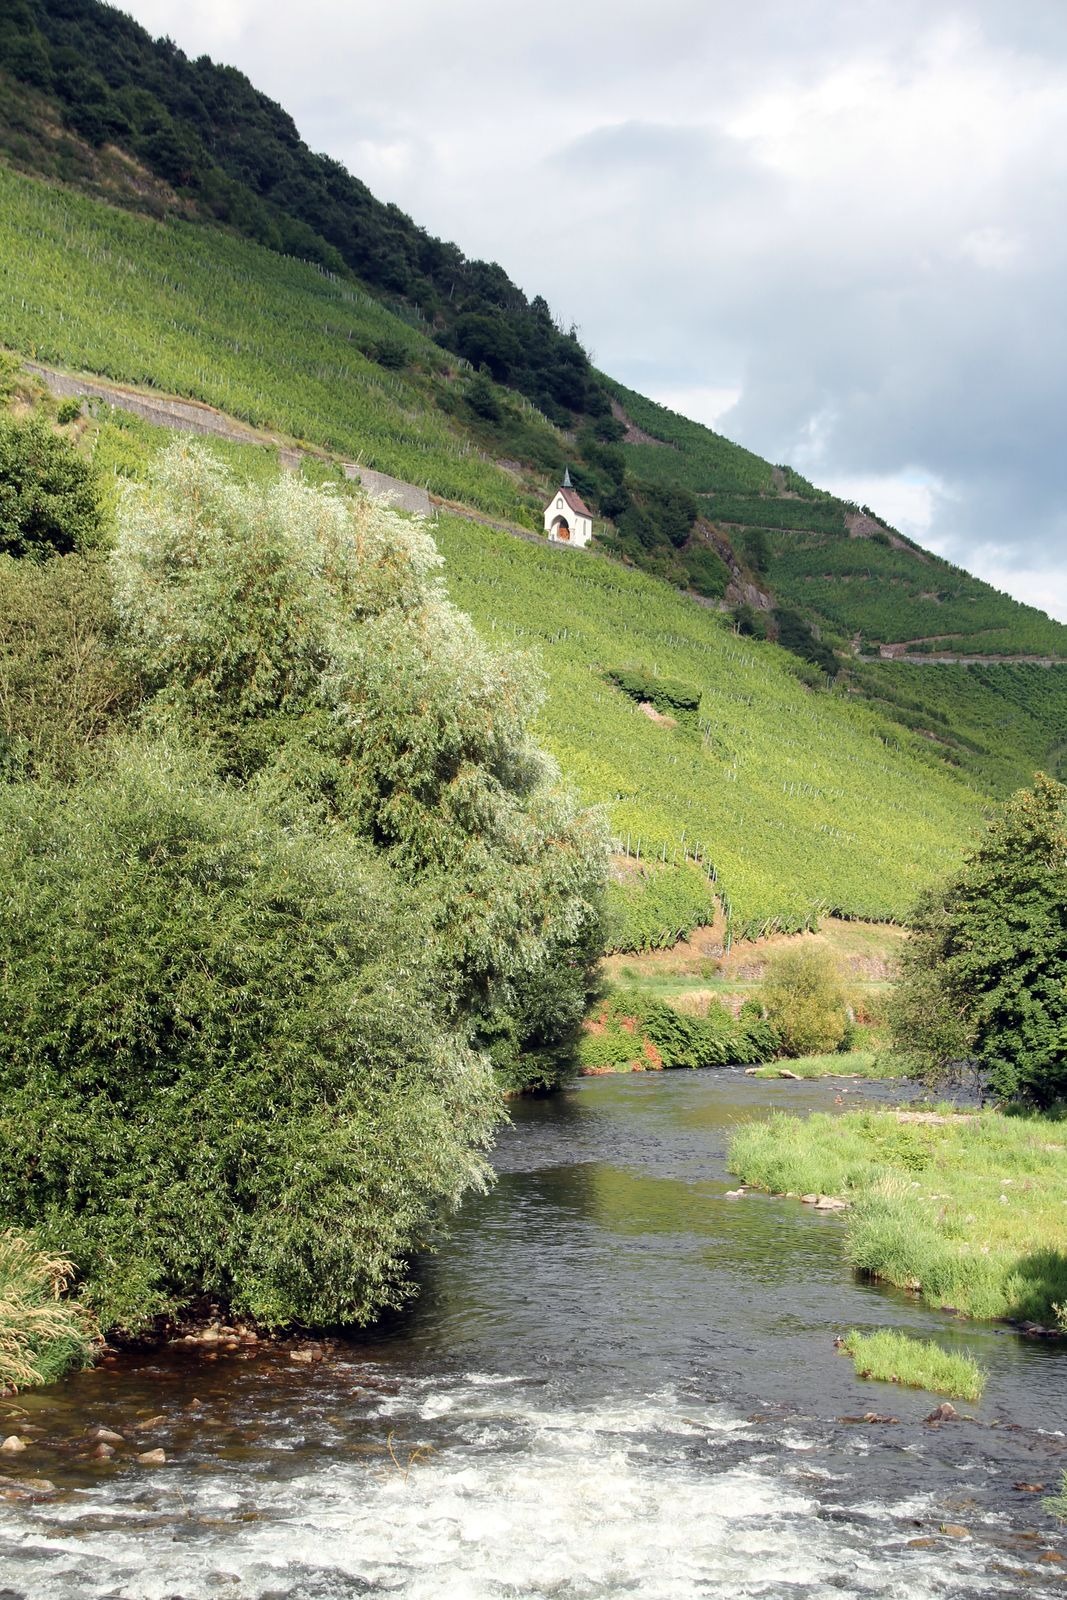 Eierküeche aux asperges blanches - Balade alsacienne à Thann